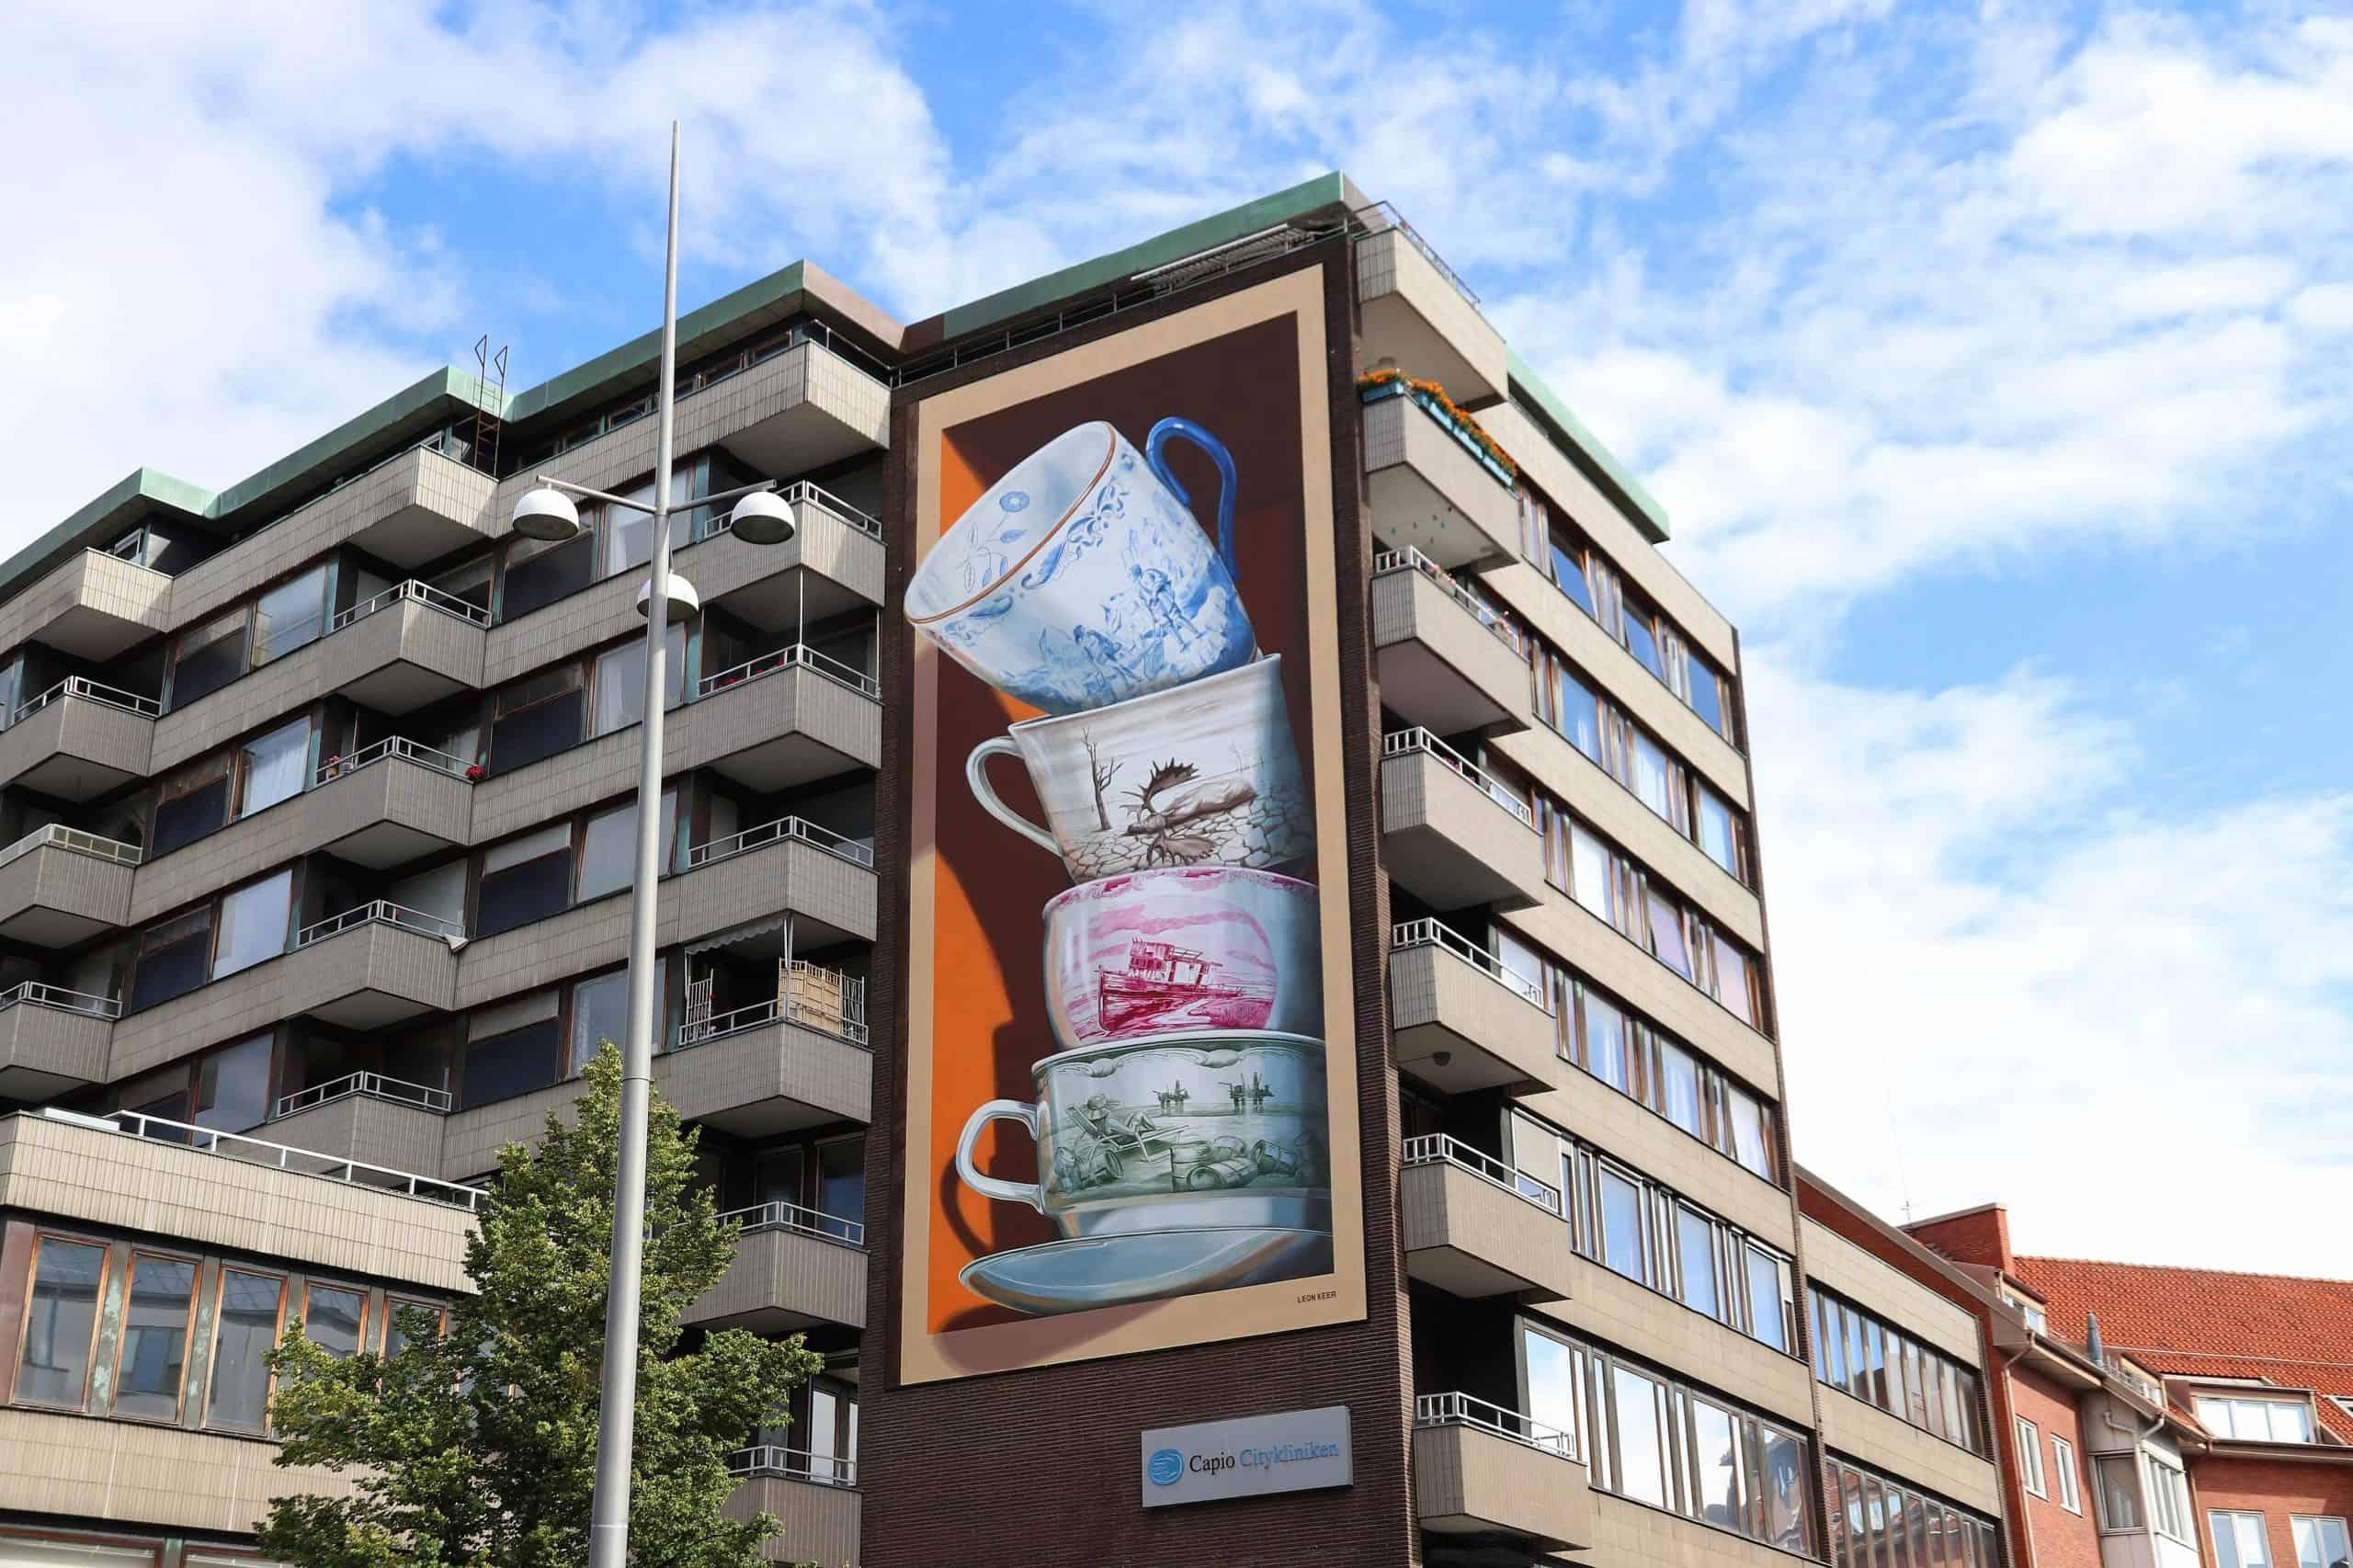 Leon Keer - Shattering, 2020 - Helsingborg (Sweden)